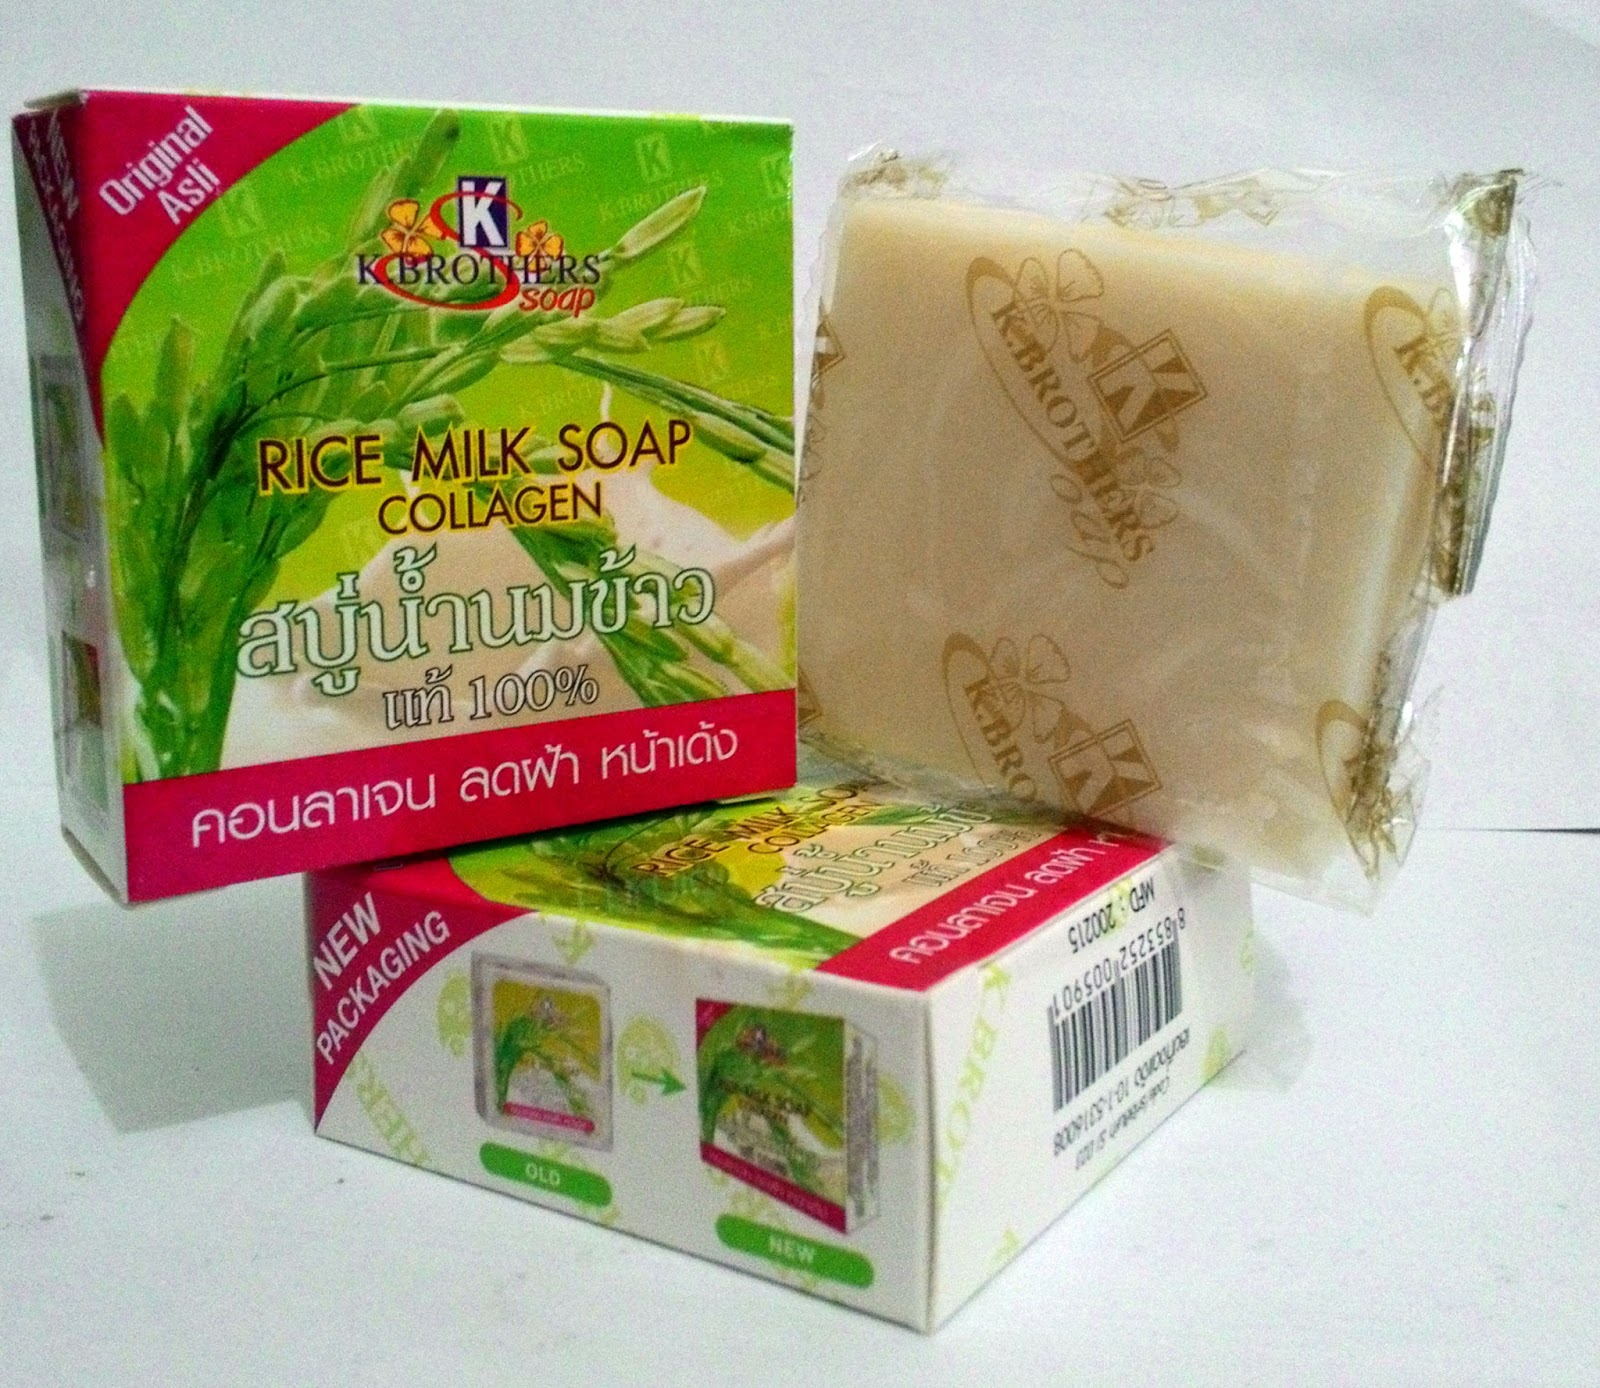 Aira Beautycare Sabun Beras Kolagen Susu Collagen